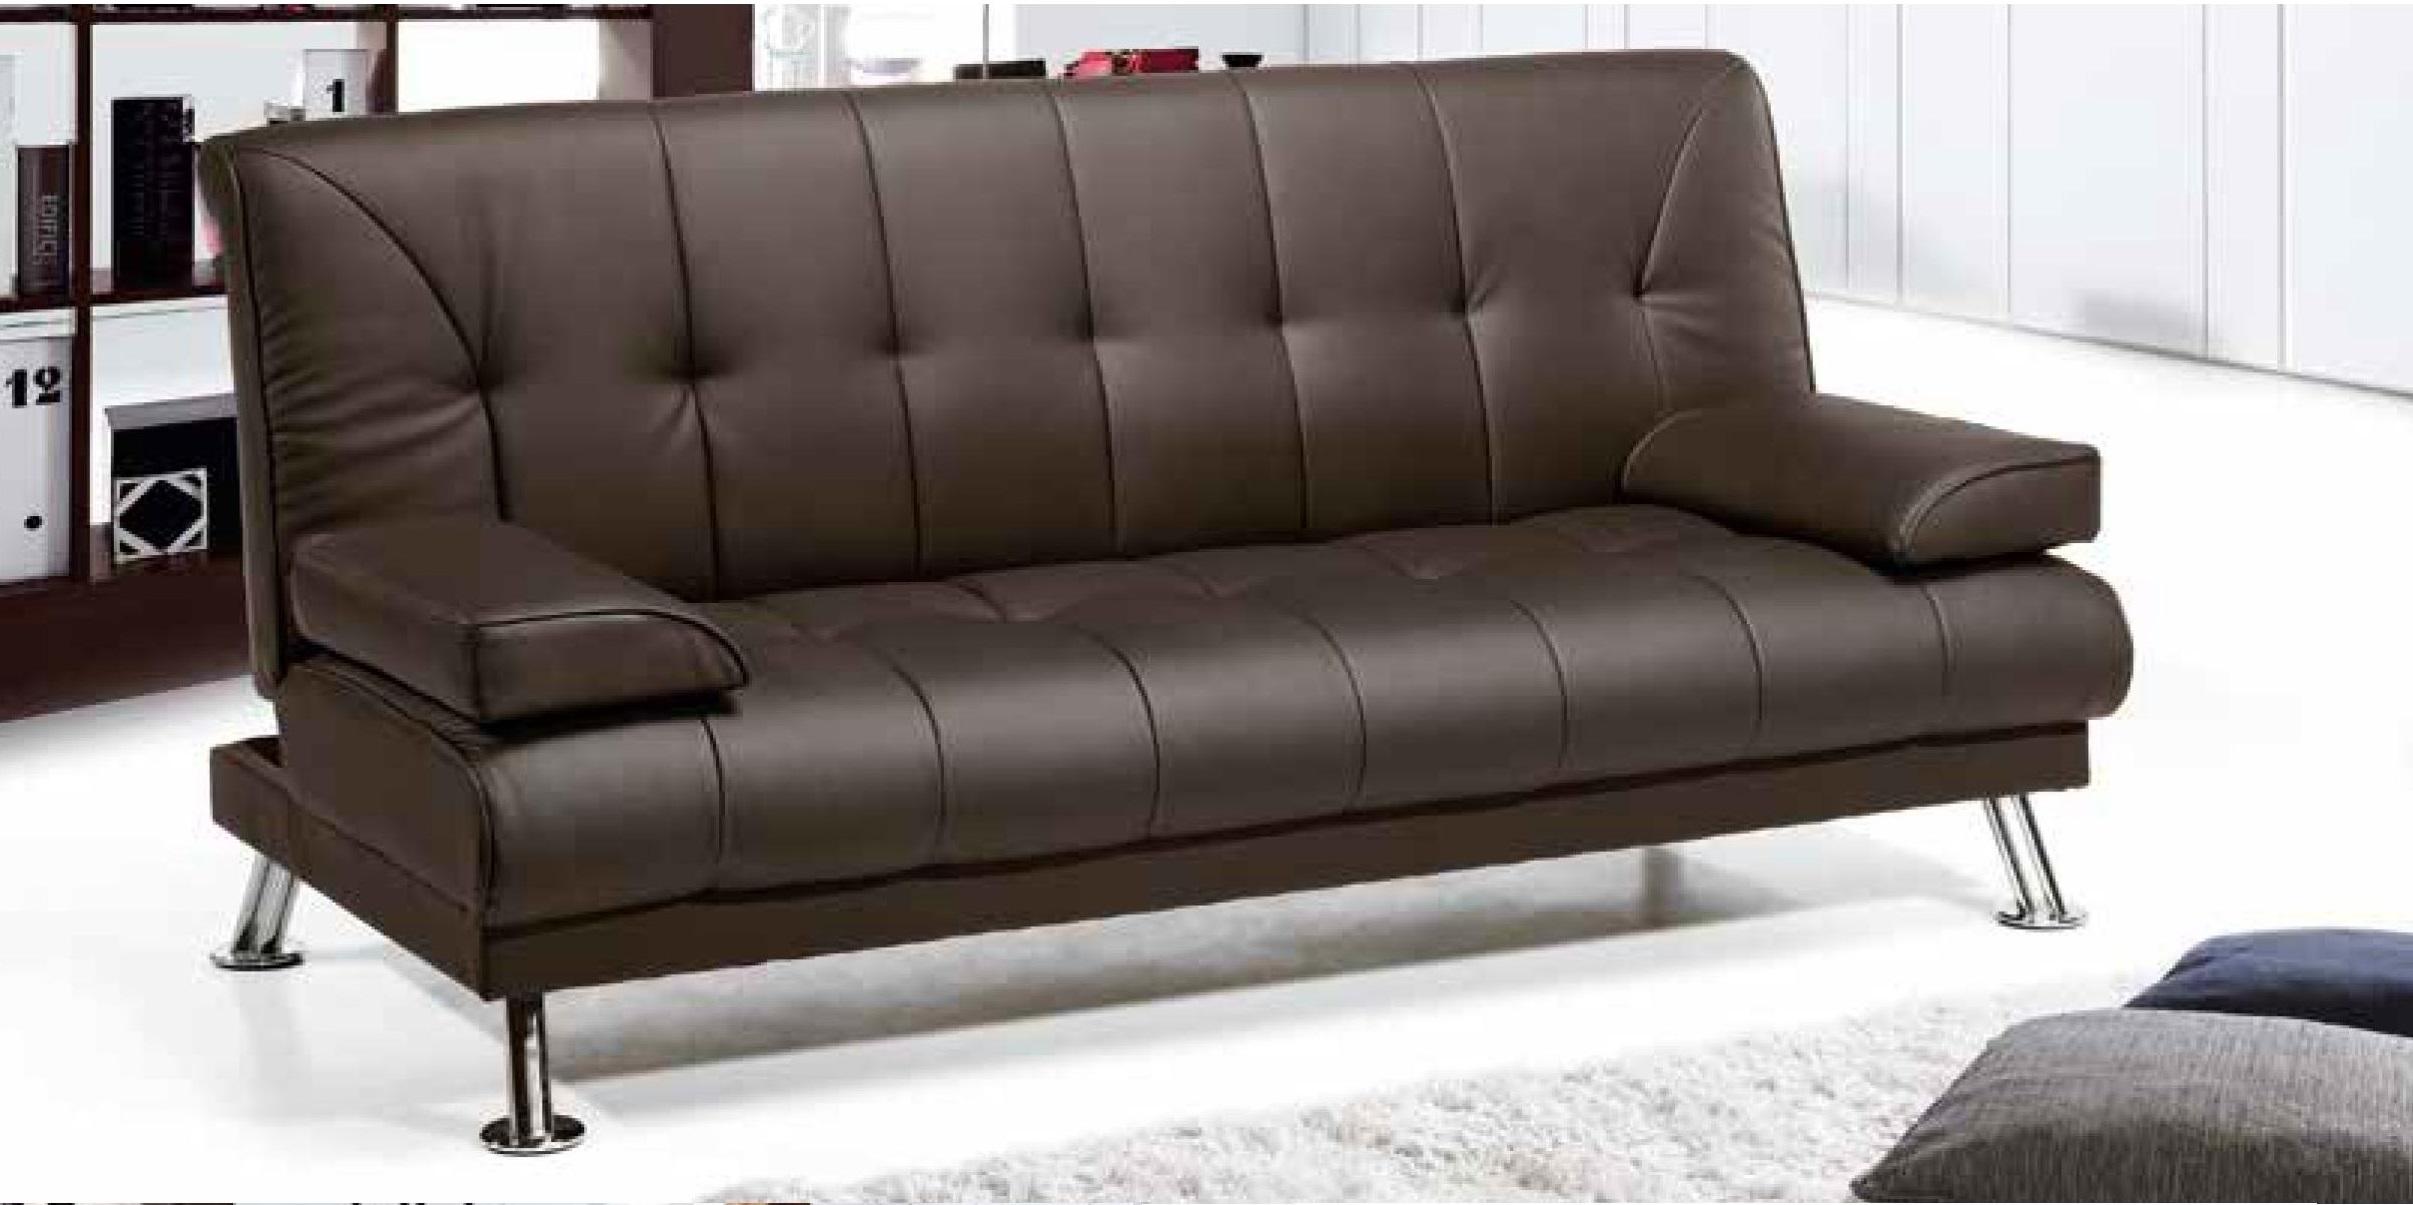 Sofa cama libro muebles valencia - Ver sofa cama ...